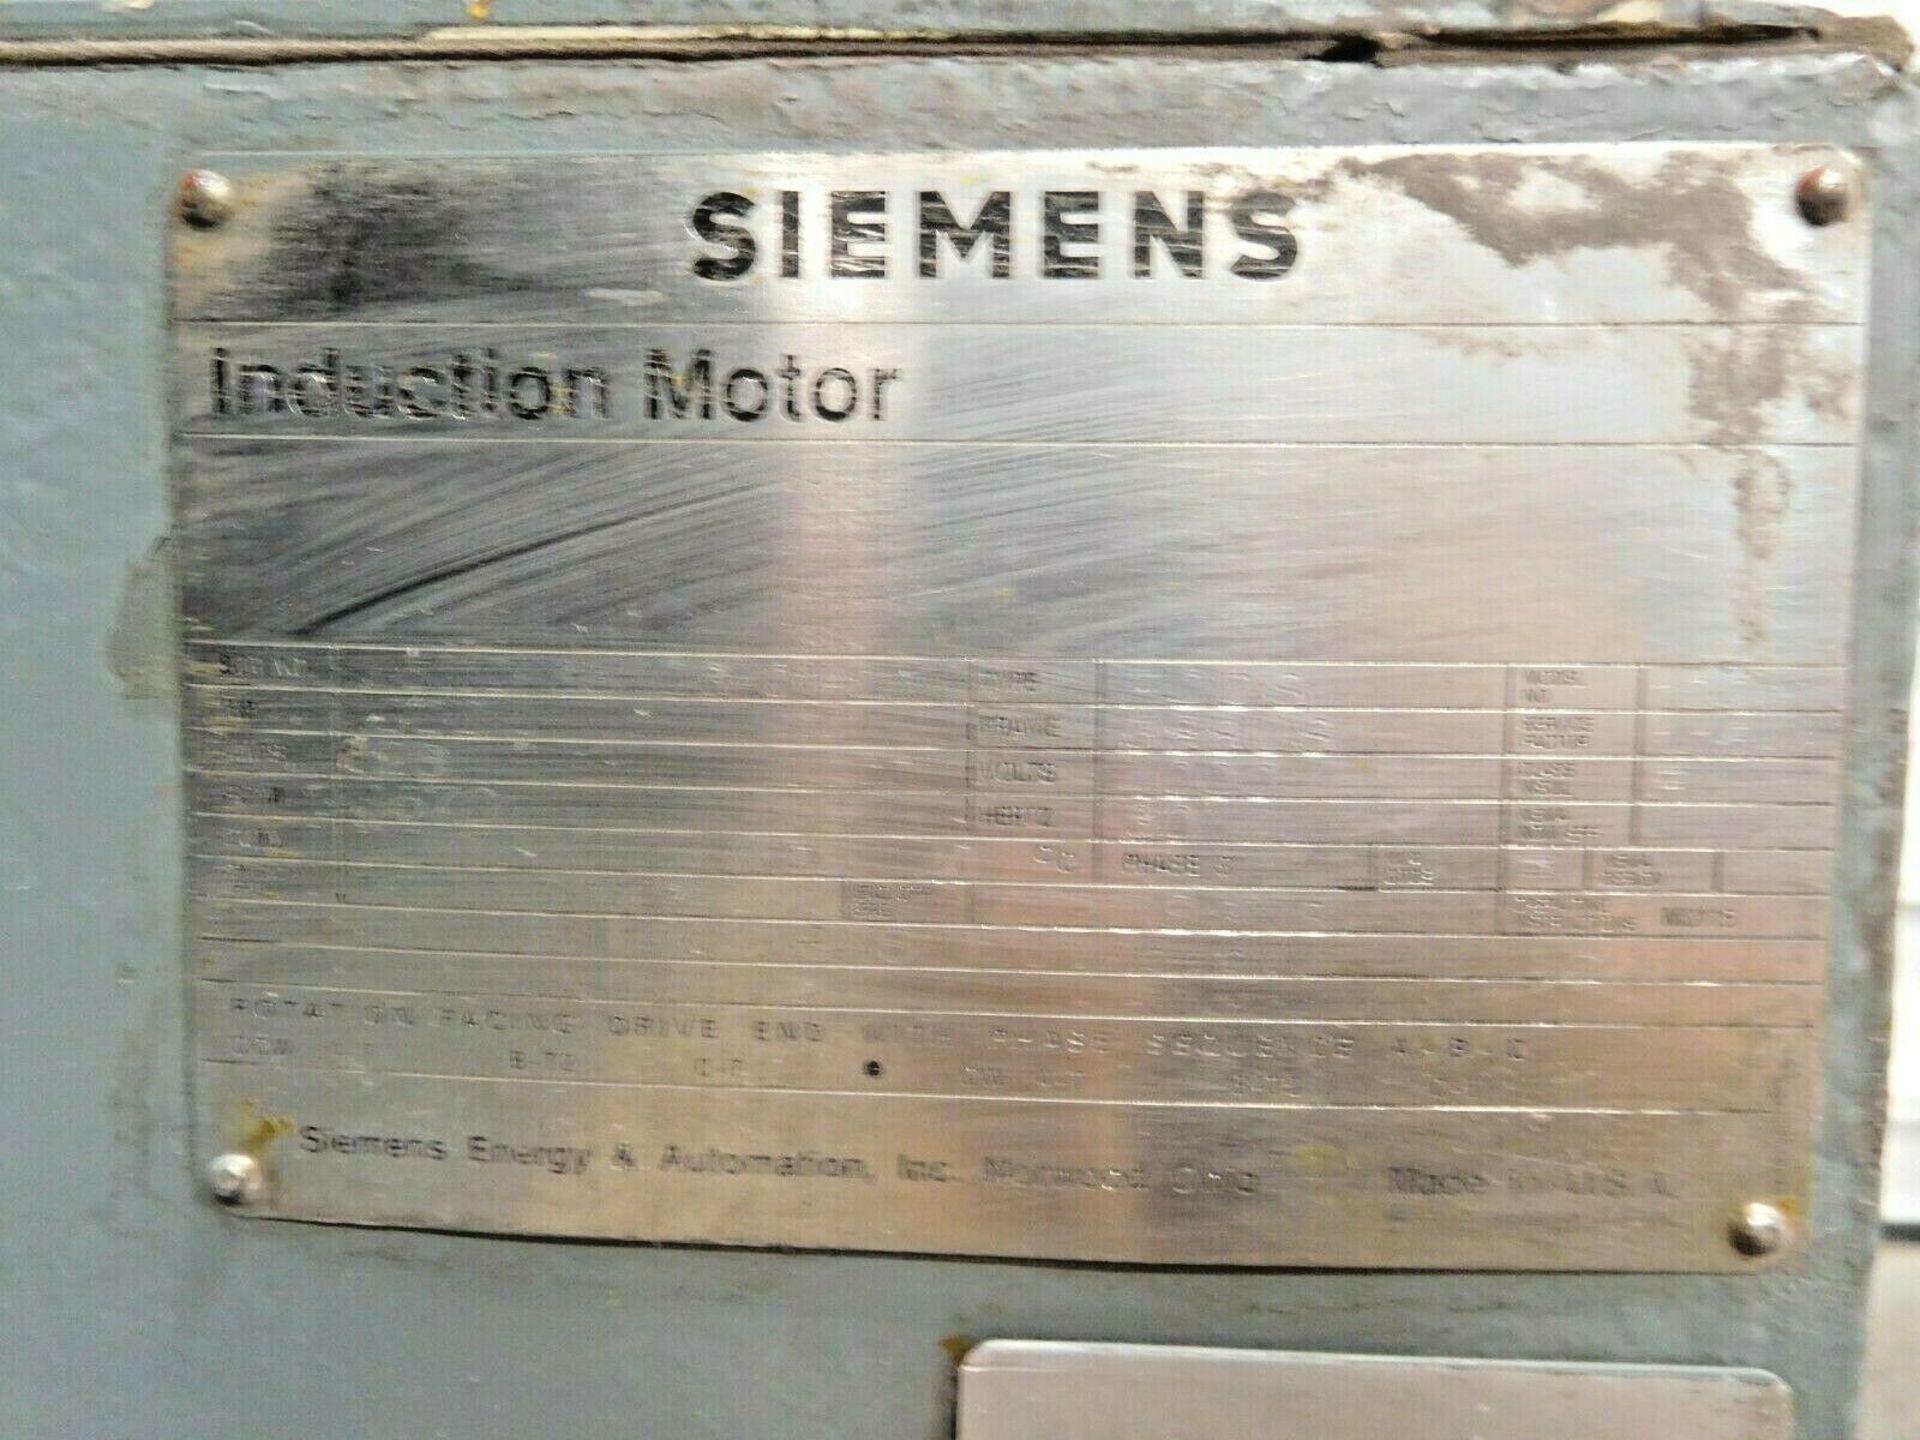 Siemens 1000 HP Induction Motor. 3 Ph. 3570 RPM. 4000 V. 60 Hz. 588US. FODS. - Image 4 of 4